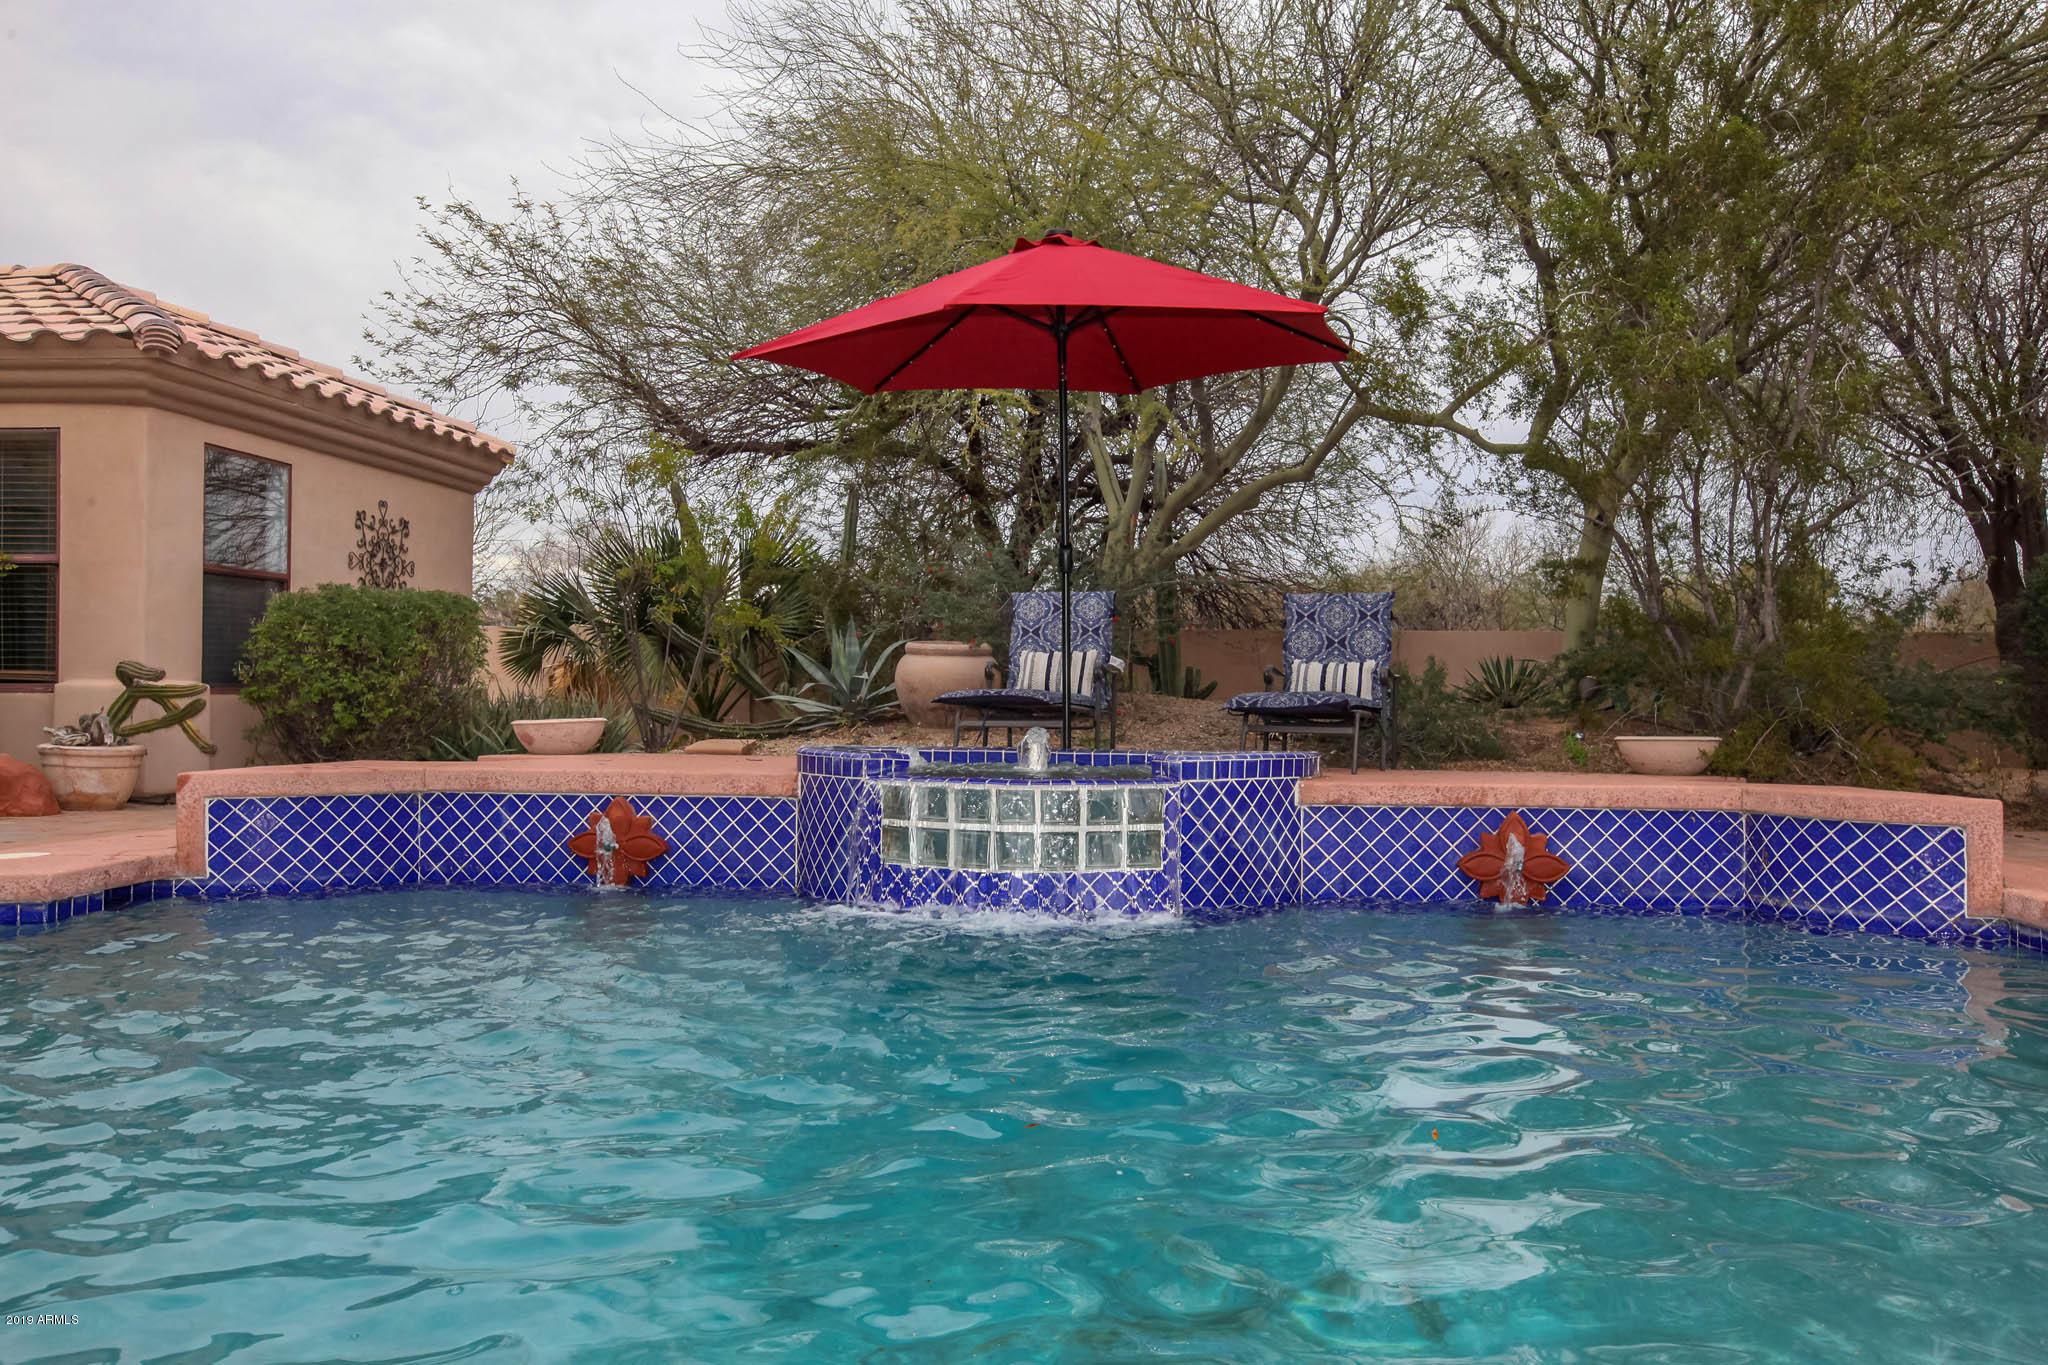 MLS 5895718 5561 S WILSON Drive, Chandler, AZ 85249 Horse Property